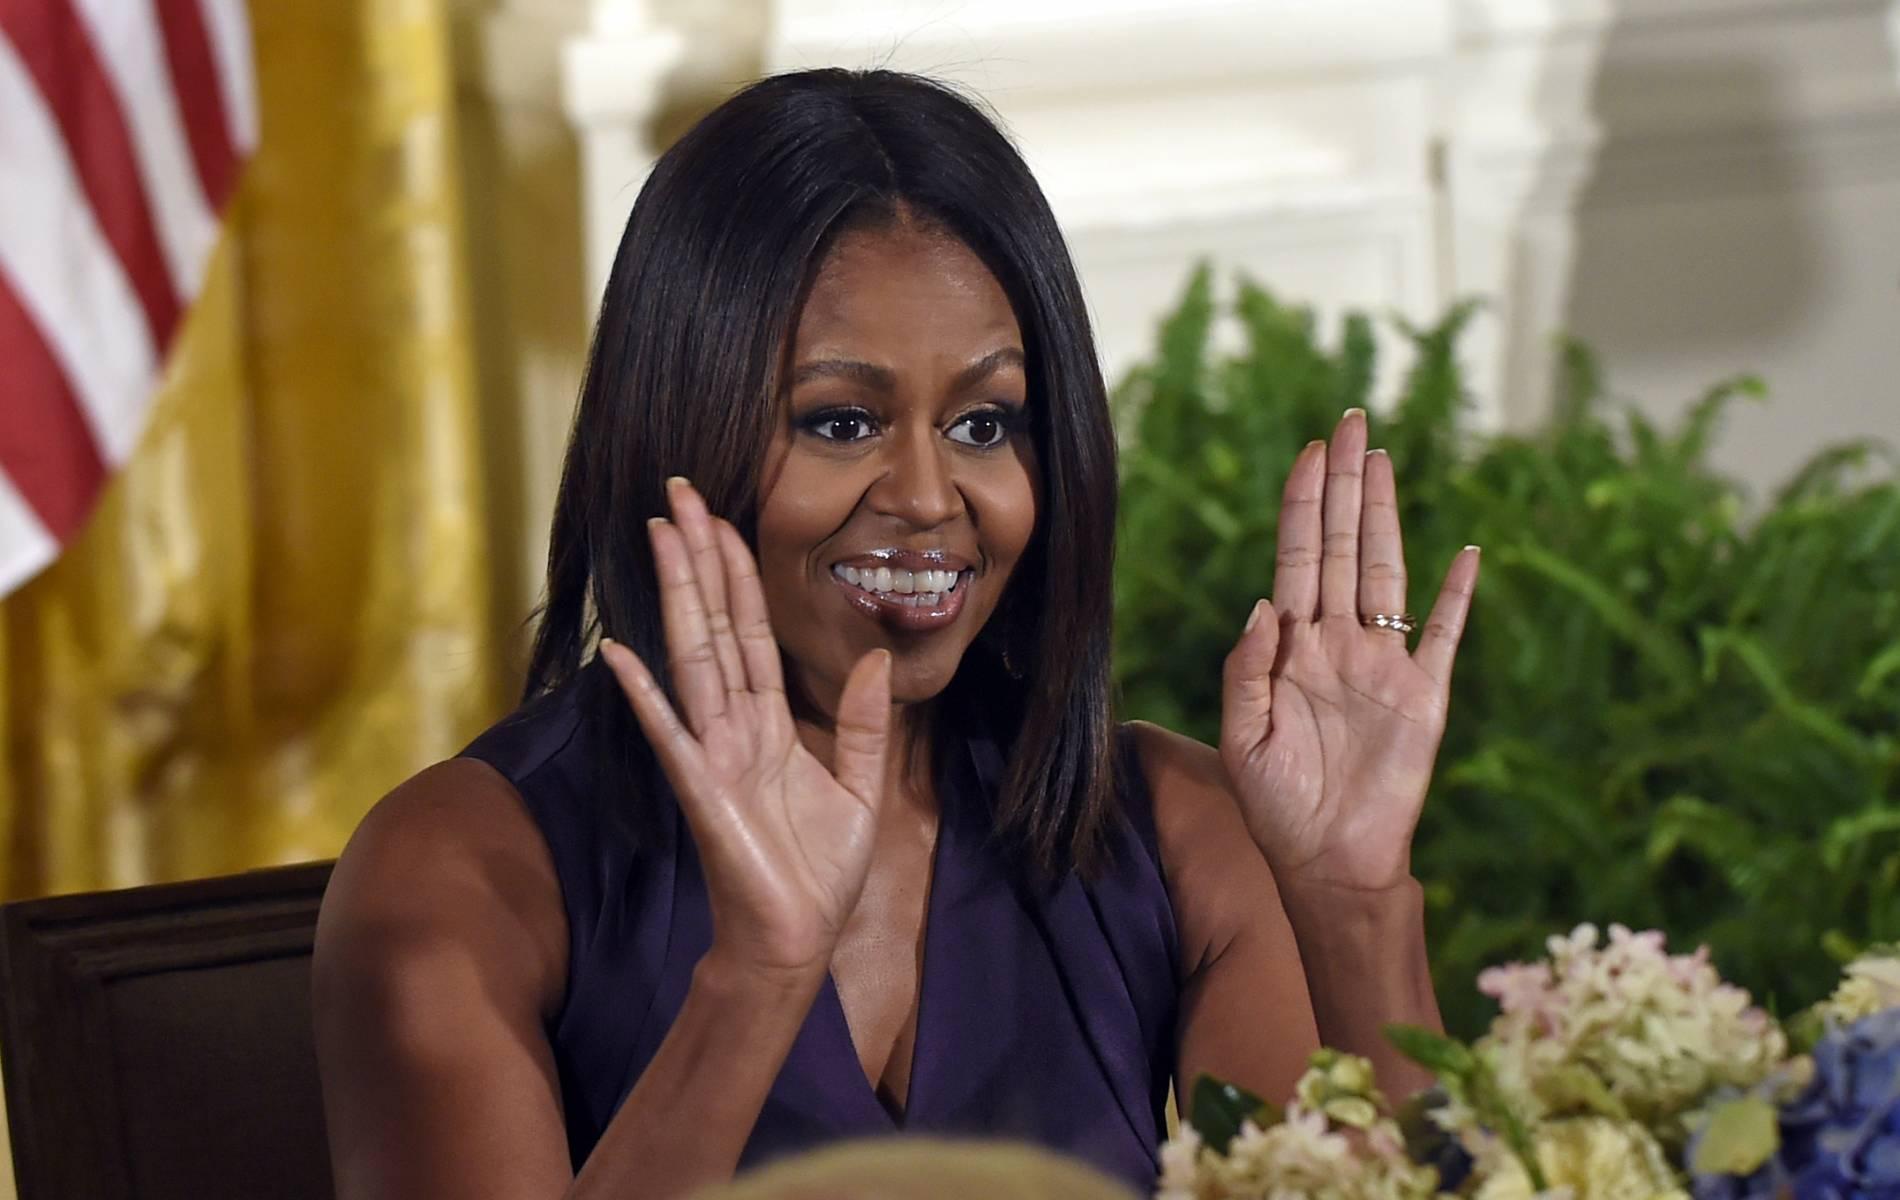 michelle obama u2019s  u201cturn down for what u201d vine is the best